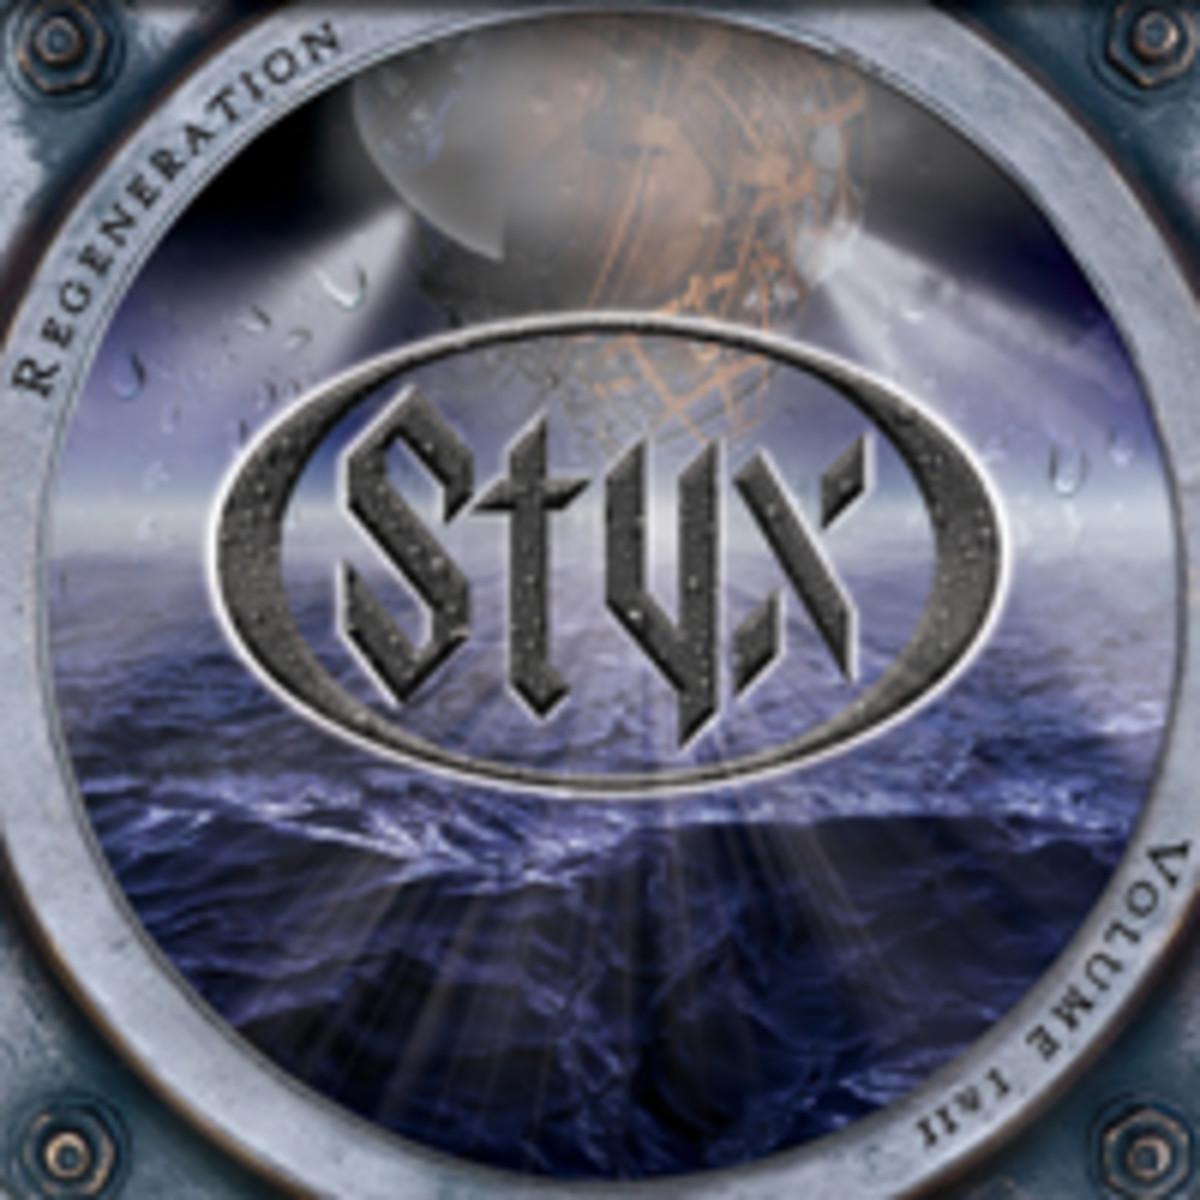 Styx Regeneration